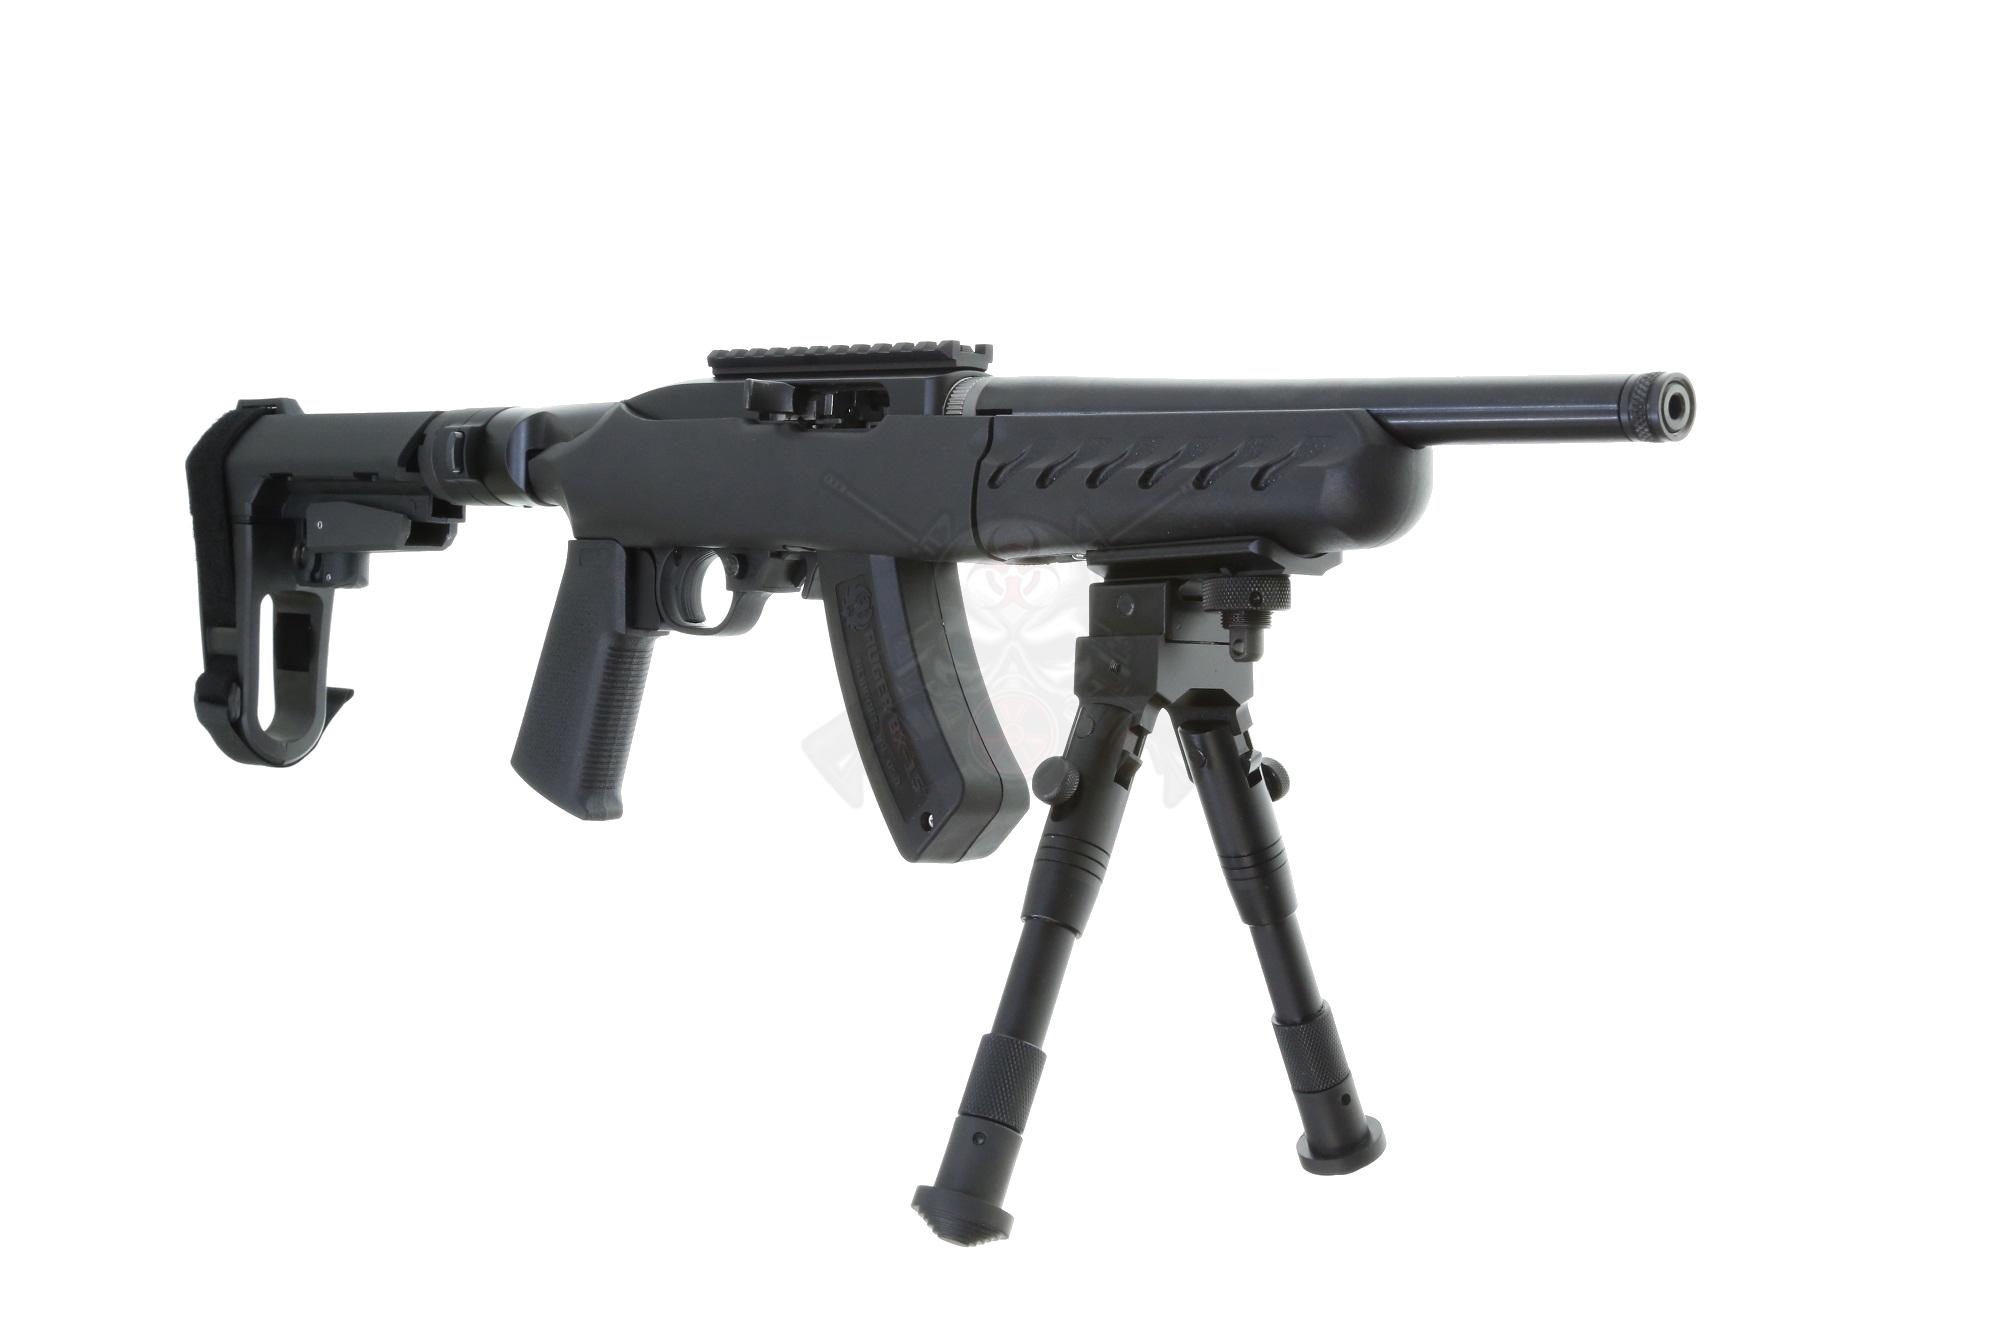 Ruger 1022 22lr Charger 10 Takedown Pistol Side Folding Sba3 Brace